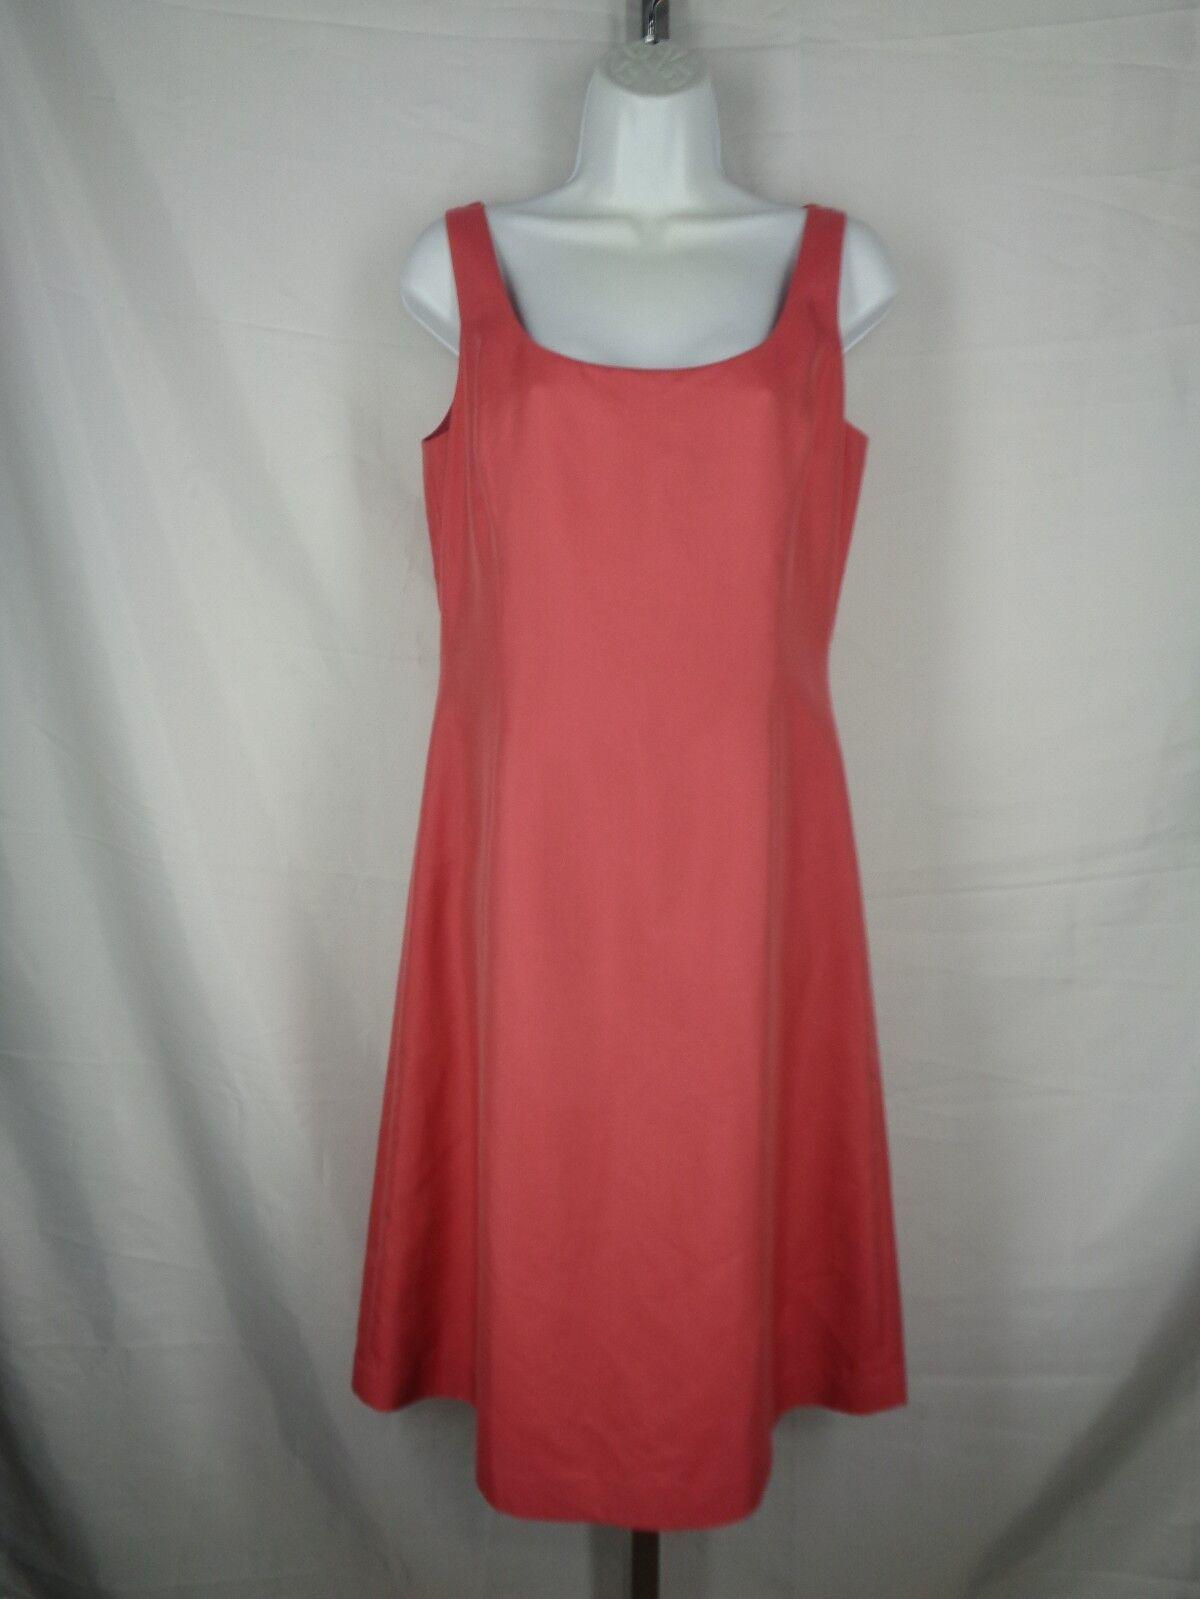 Ann Taylor Pink Dress Size 6 Cotton Silk Sleeveless New